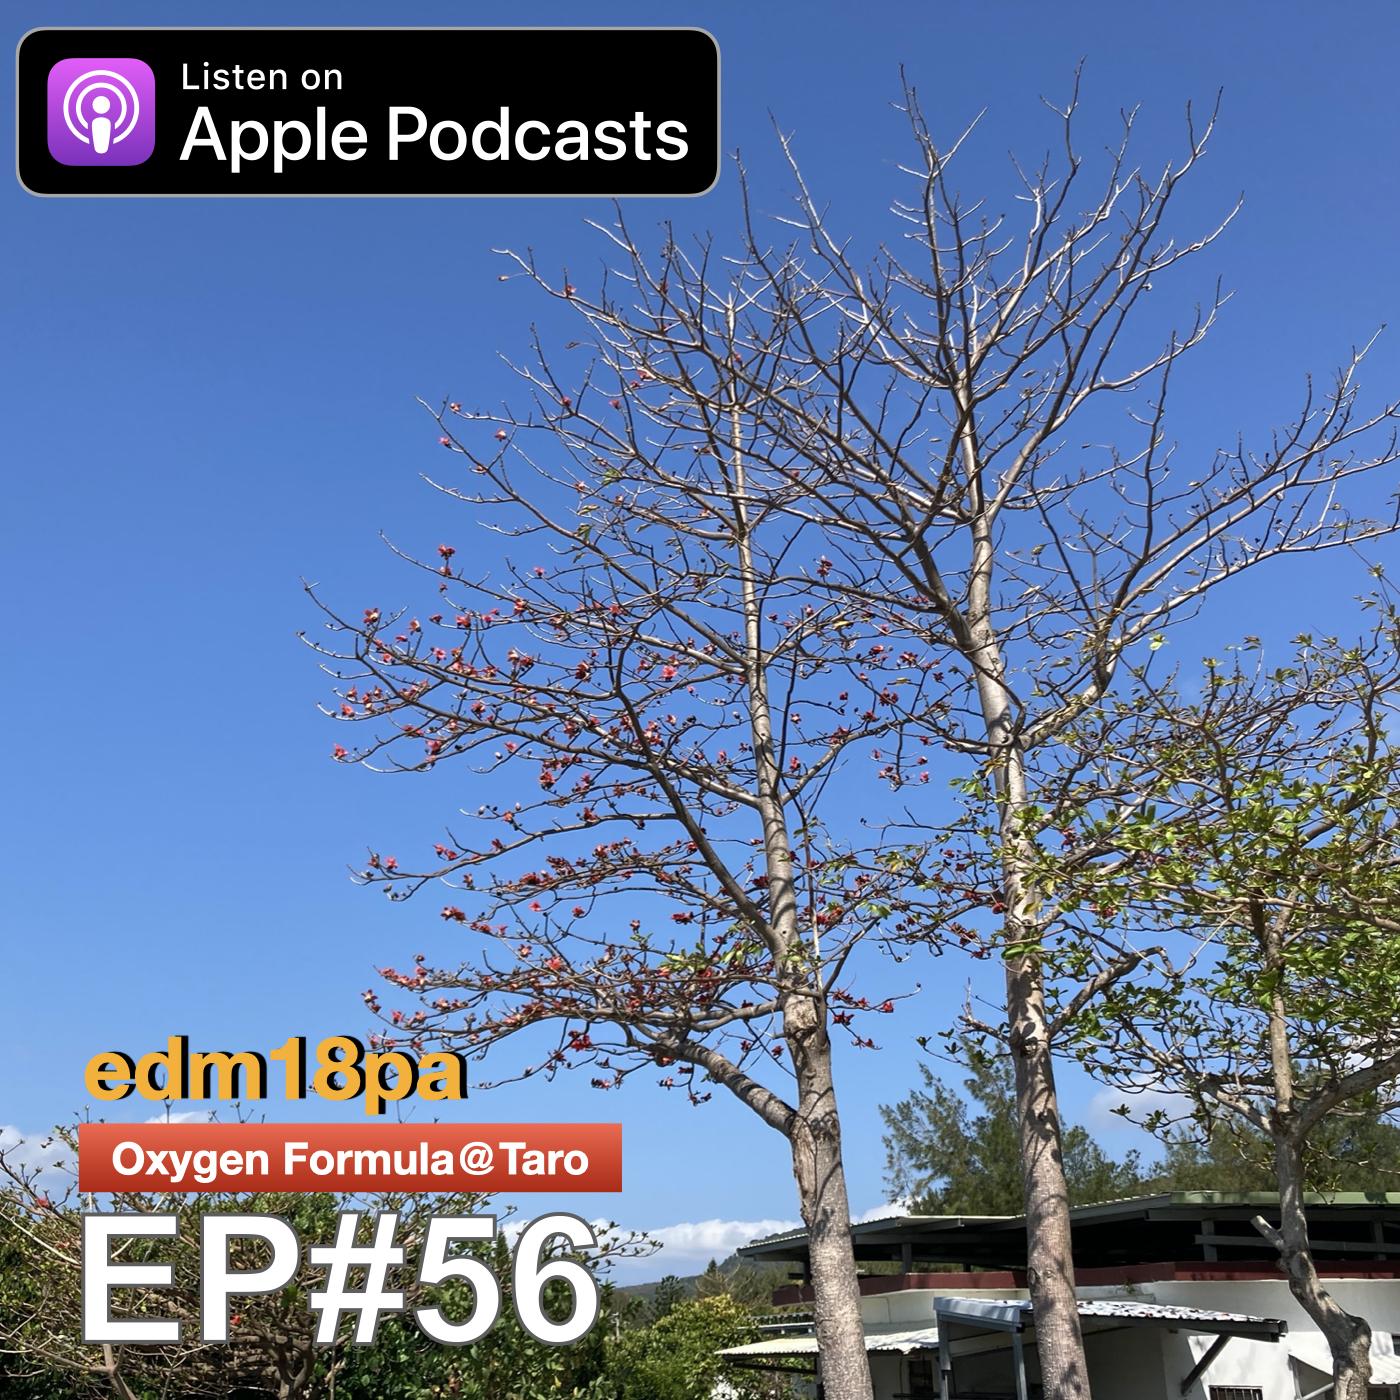 EP56 | Chill/Positive - 去濕排毒好心情電音輯『守護家園&保衛台灣(十一)』